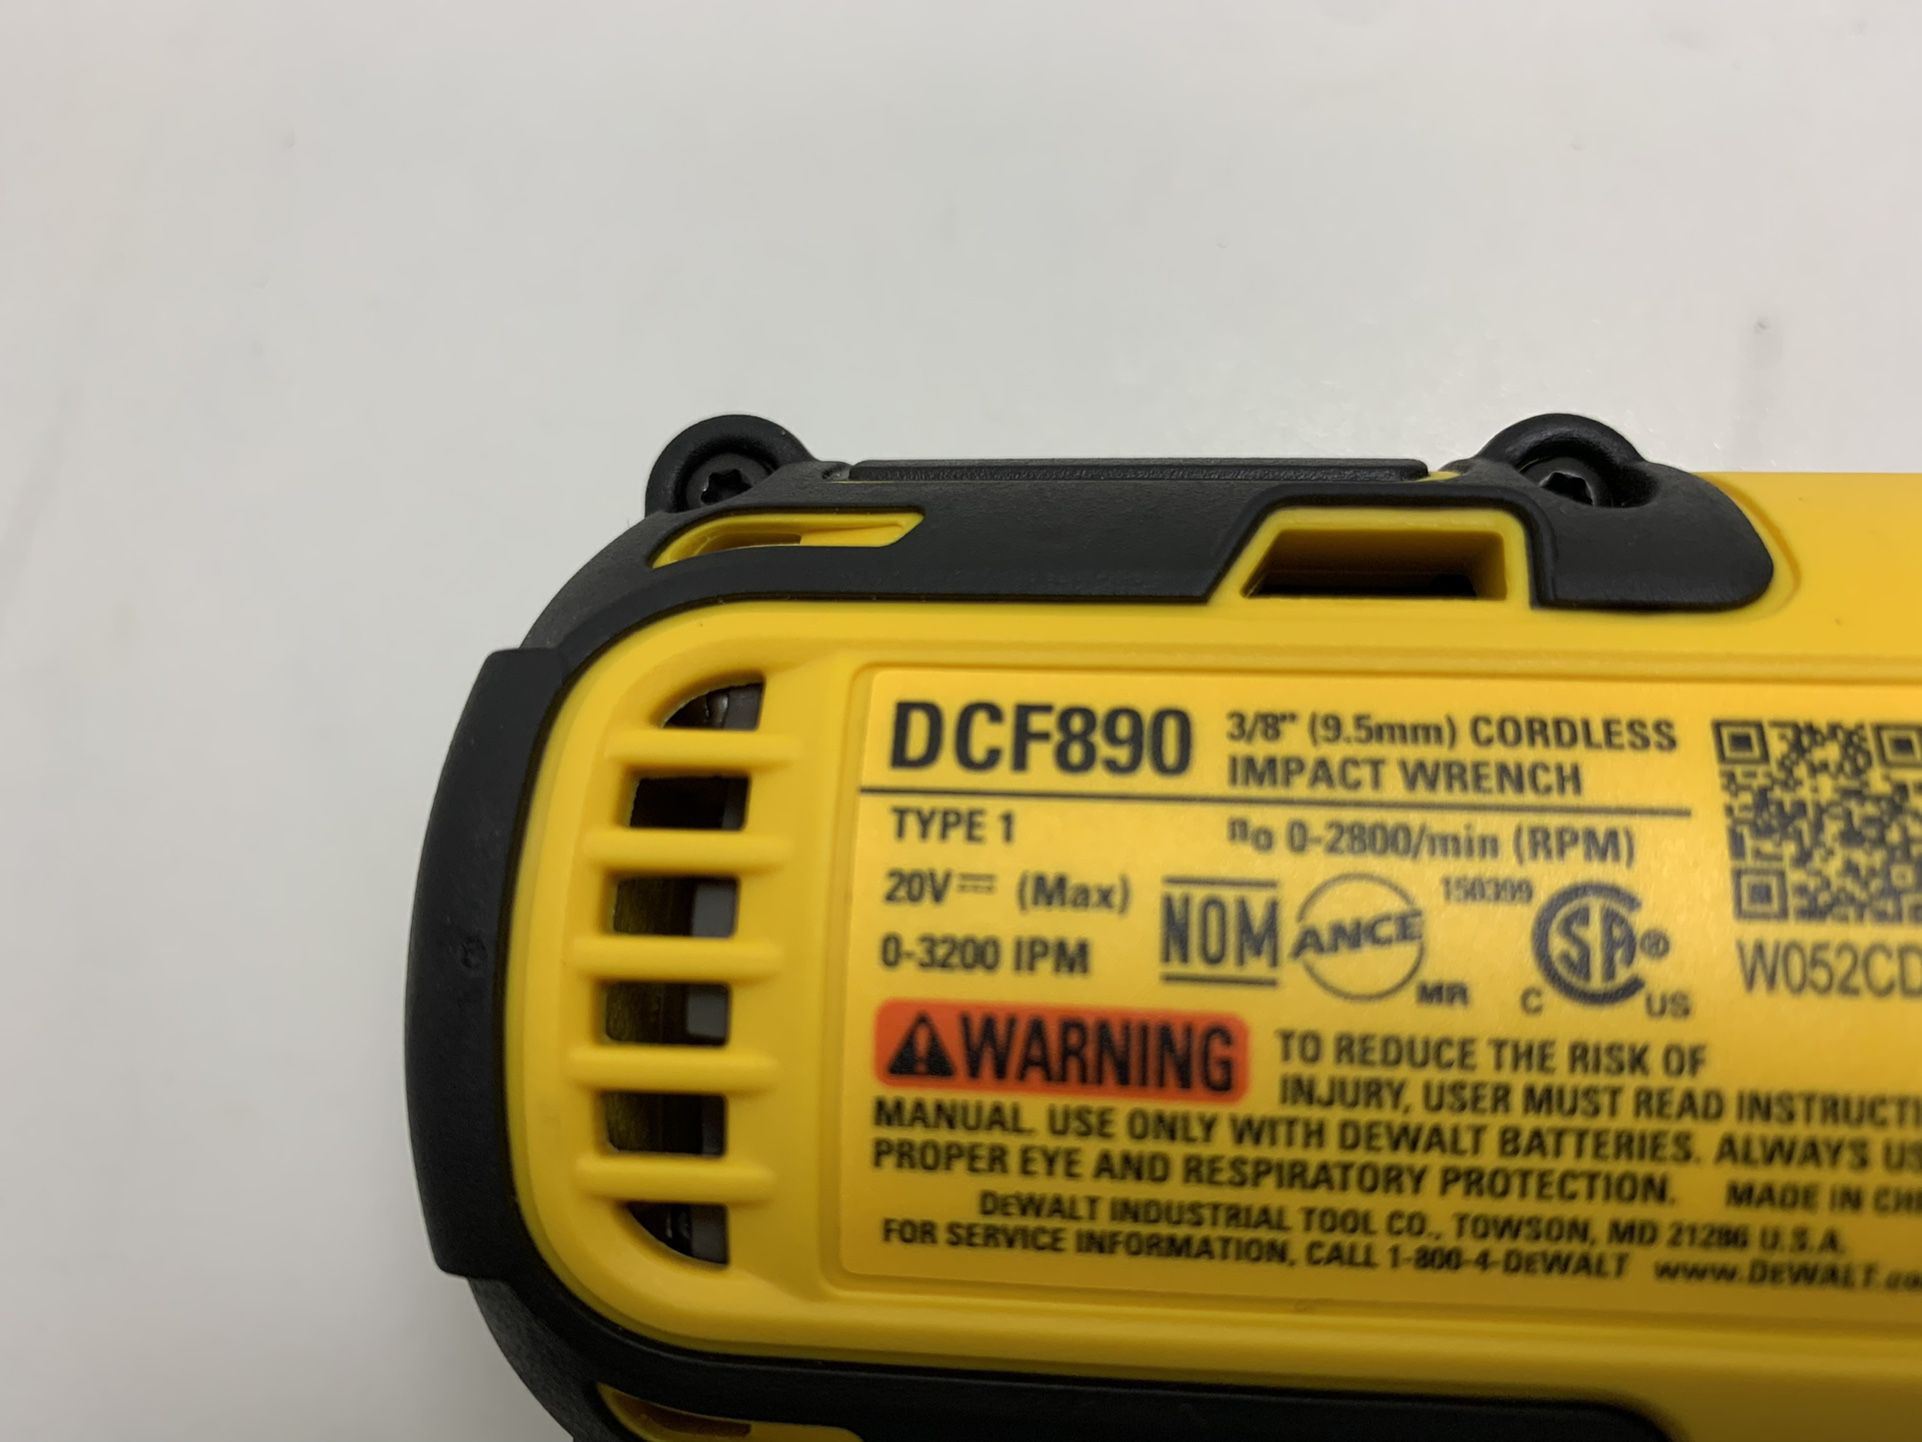 DEWALT DCF890 3/8 CORDLESS IMPACT WRENCH ONLY TOOL BRAND NEW SOLO HERRAMIENTA